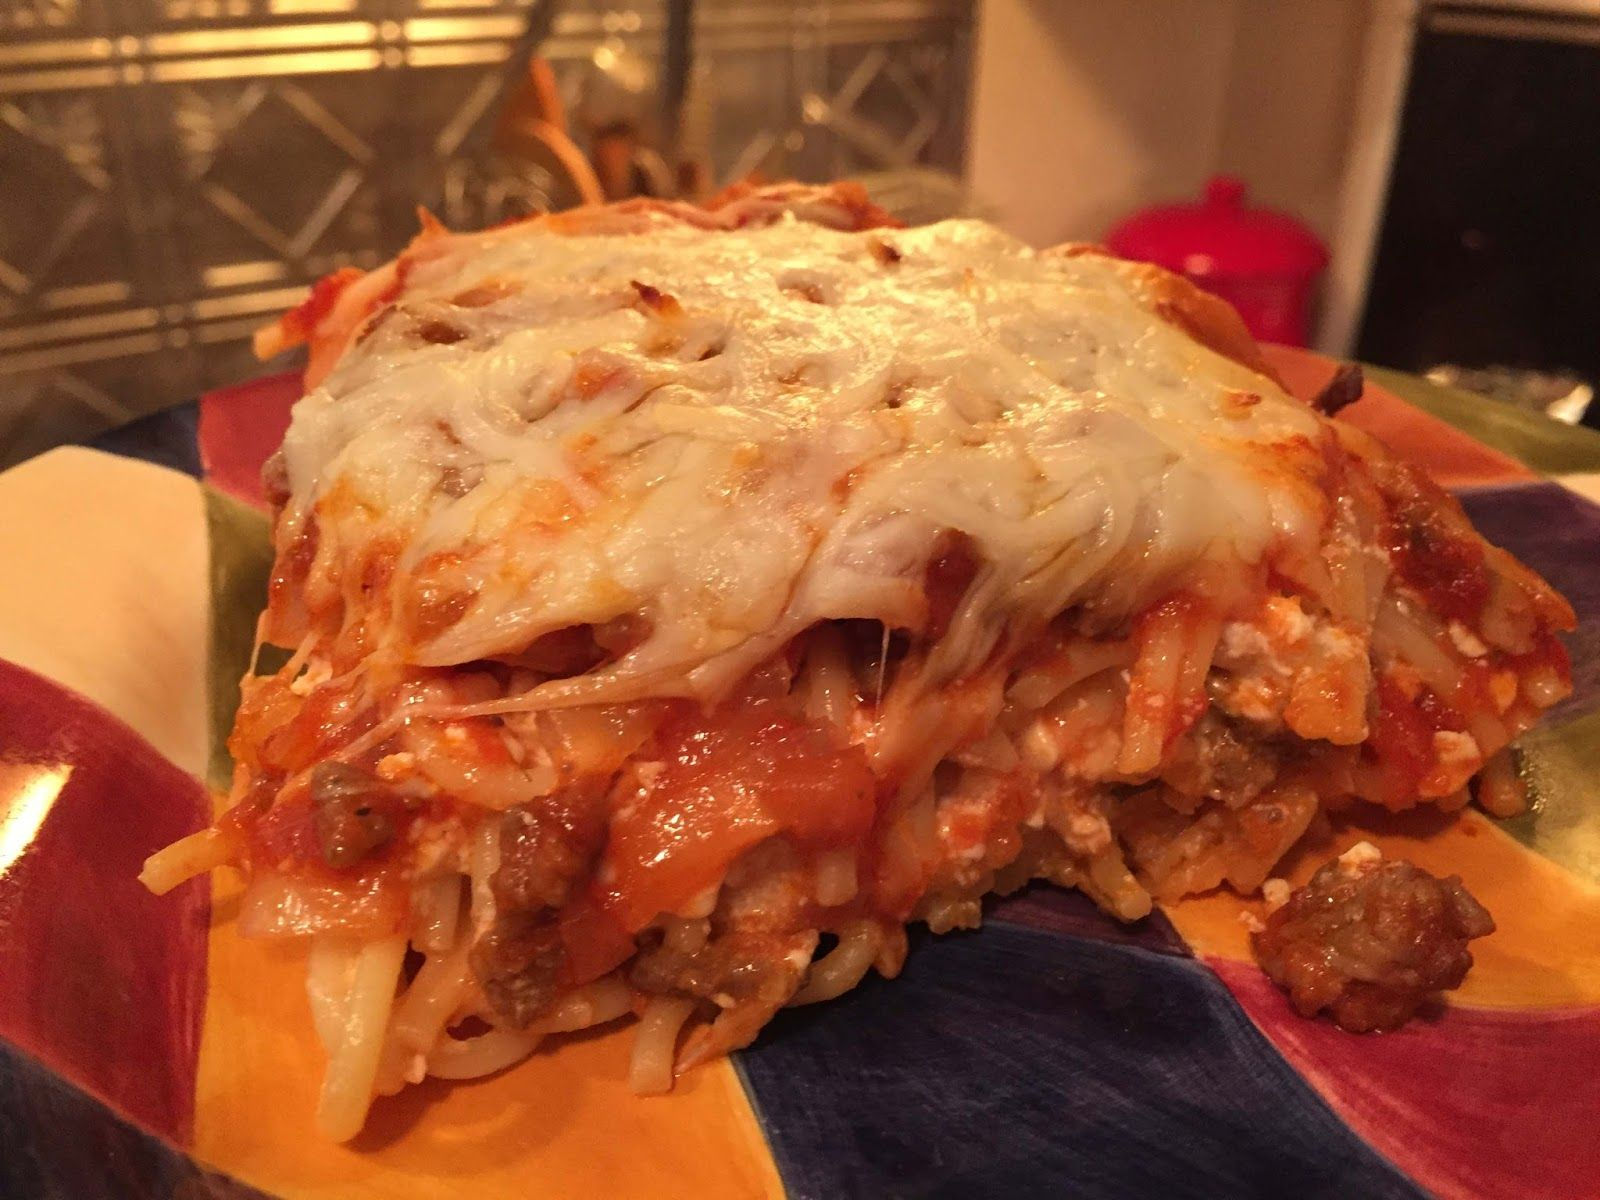 Freezer meal baked spaghetti freezer meals baked